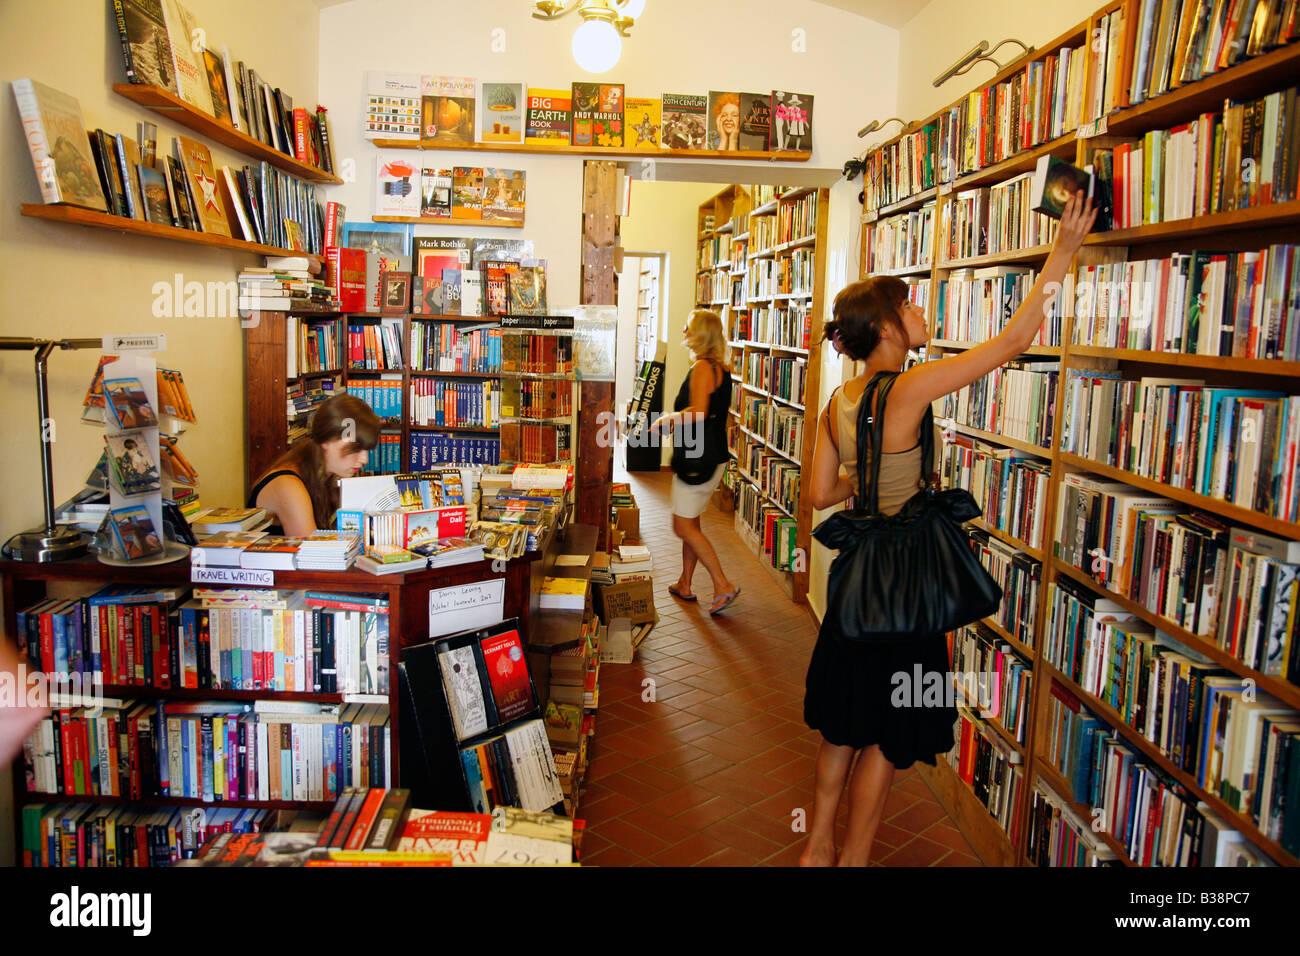 Aug 2008 - Shakespeare book shop at U lezickehu seminare 10 street Mala Strana Prague Czech Republic - Stock Image